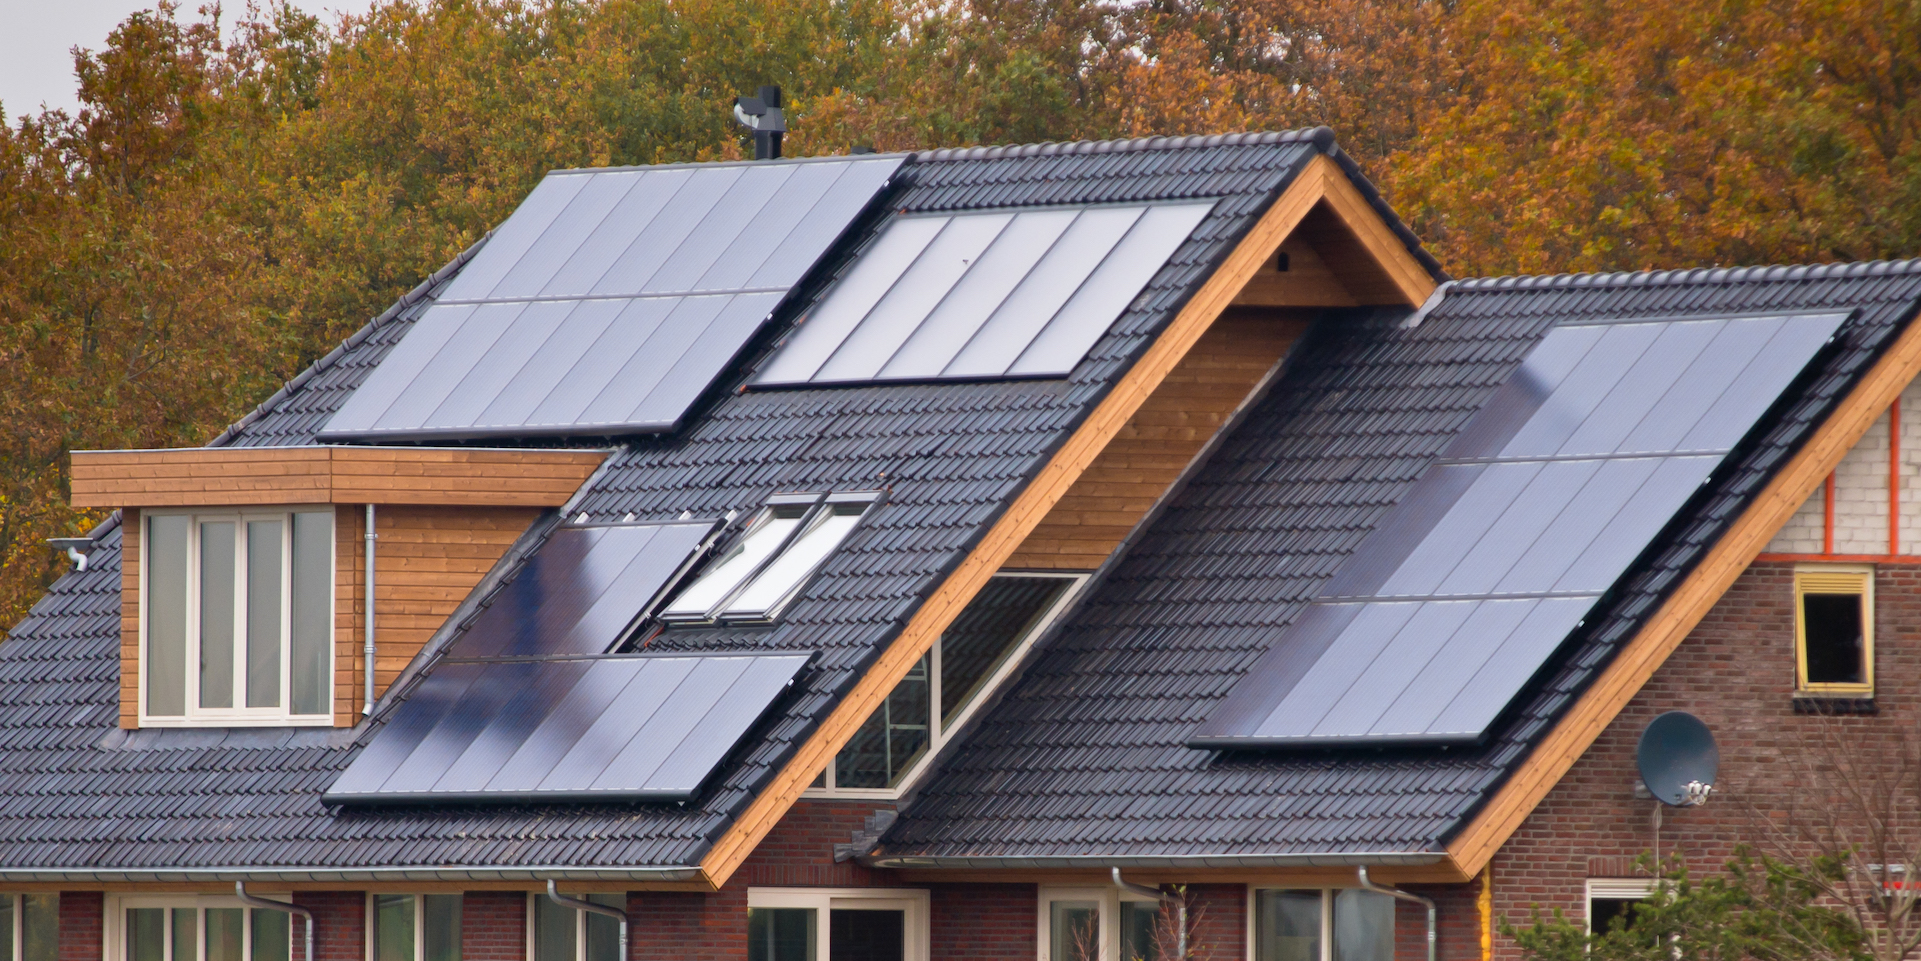 solar-panels-on-house-flagstaff.jpg